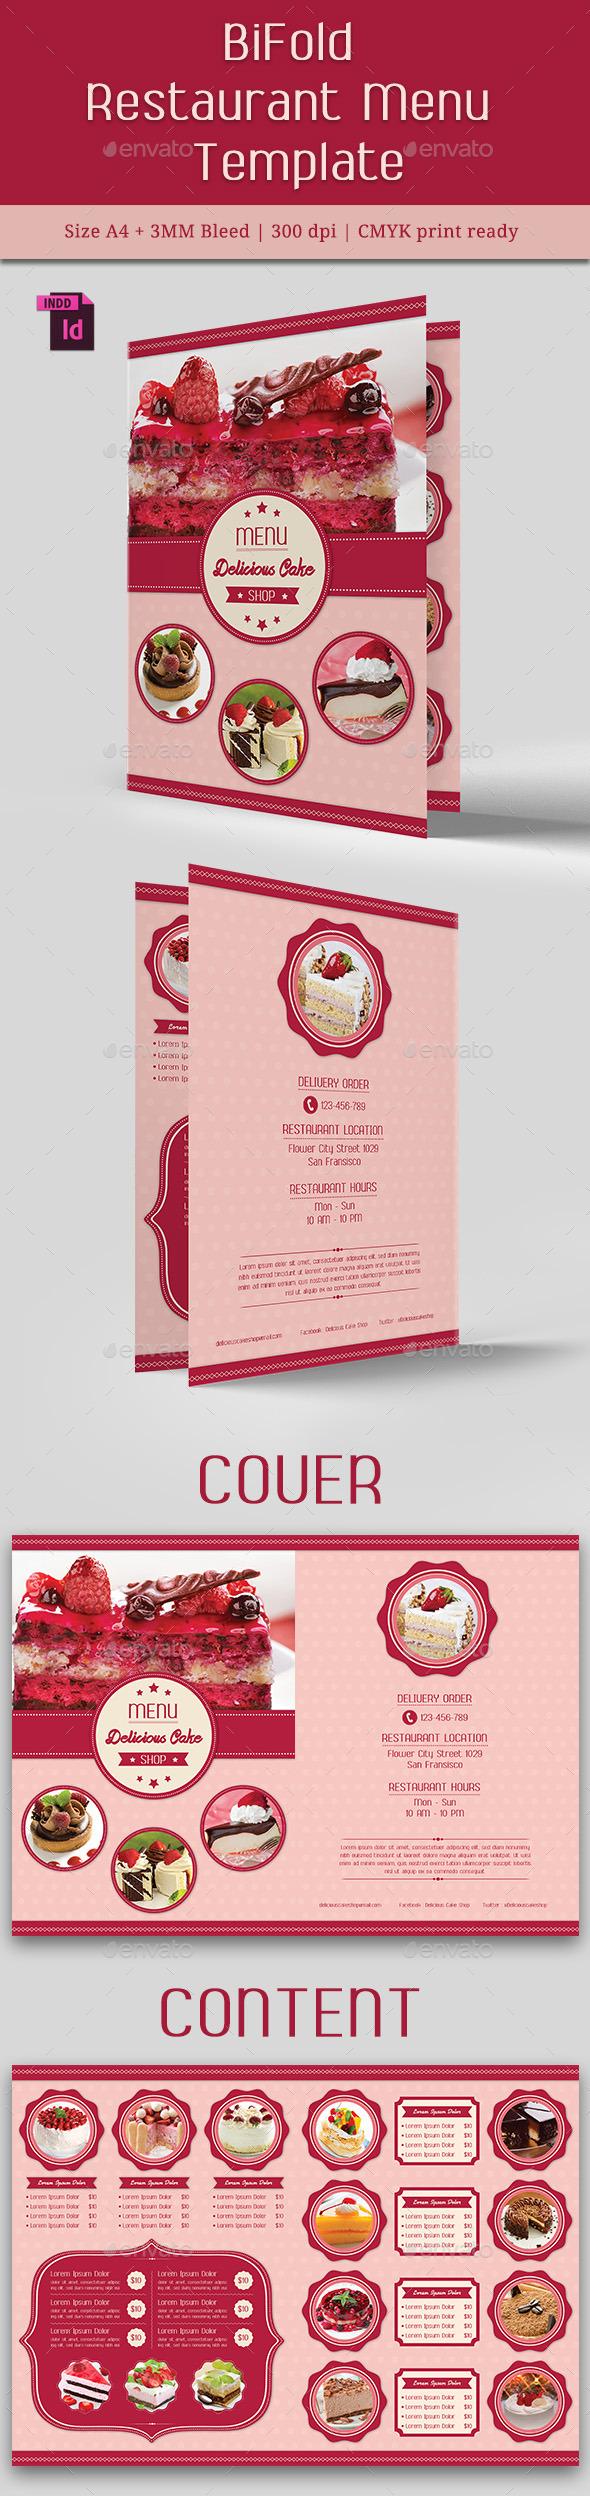 Cake Menu Graphics Designs Templates From Graphicriver